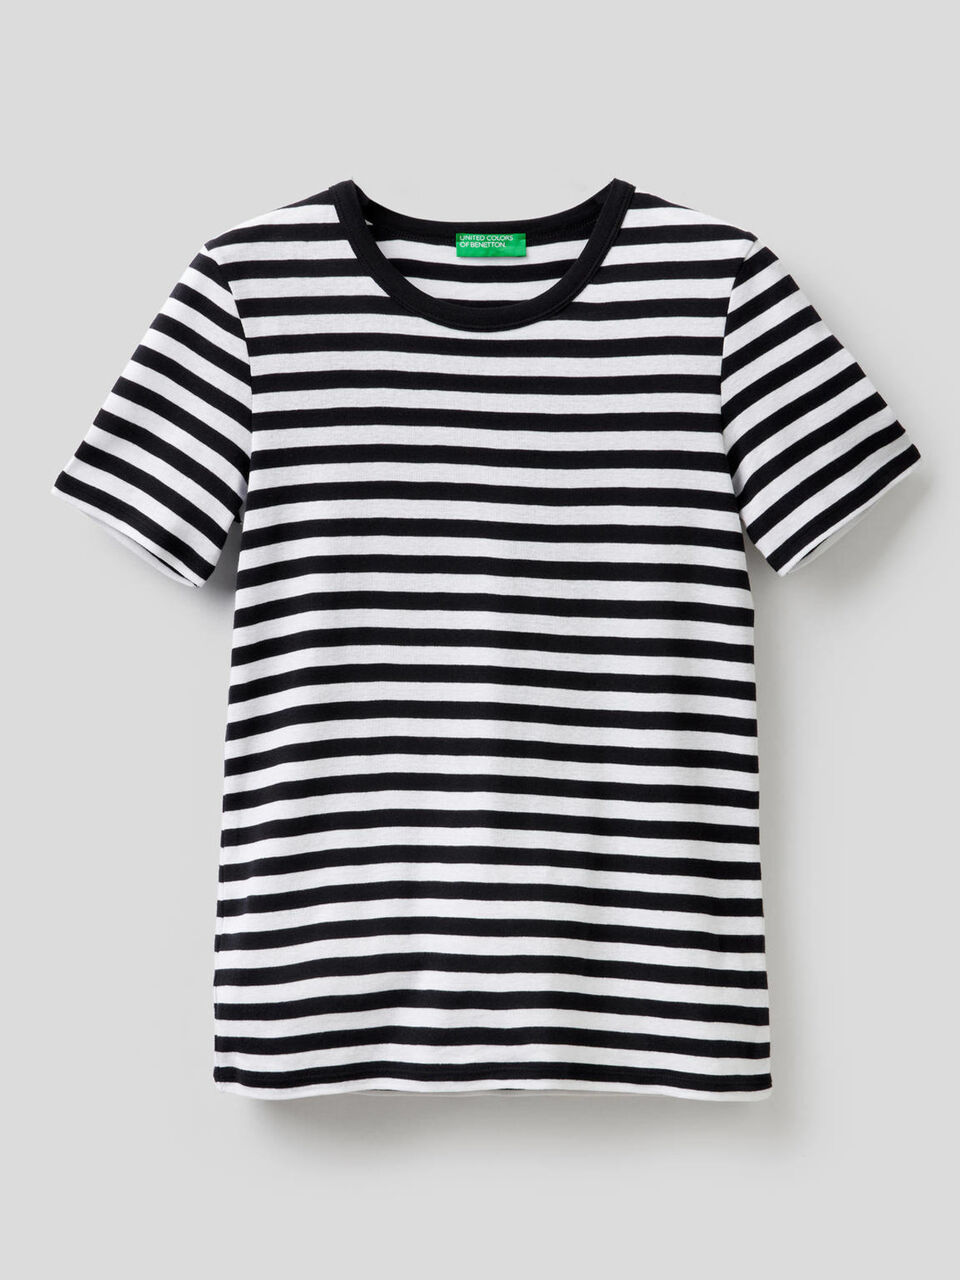 Camiseta de estilo marinero